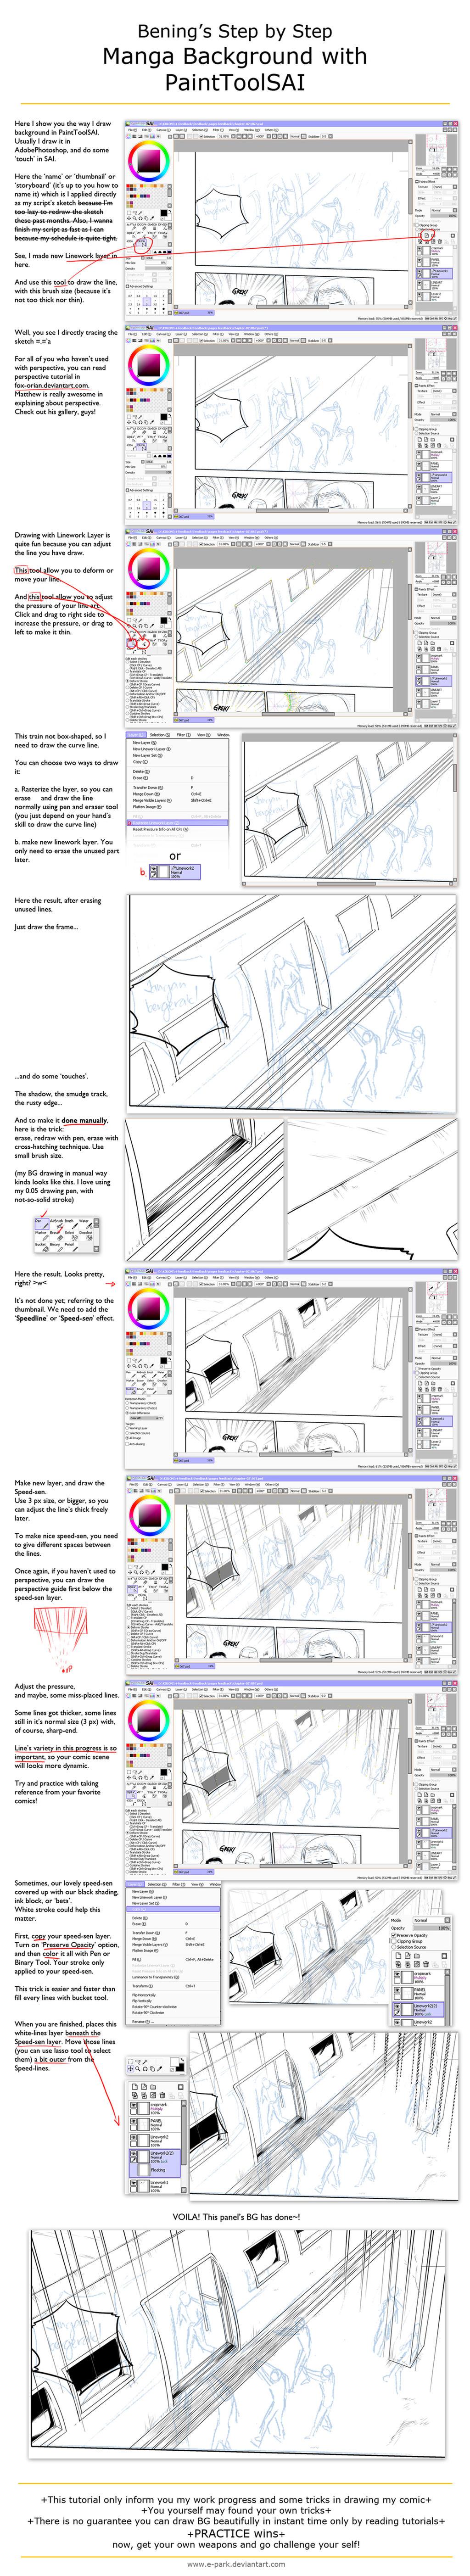 Drawing Manga Background with SAI by E-park